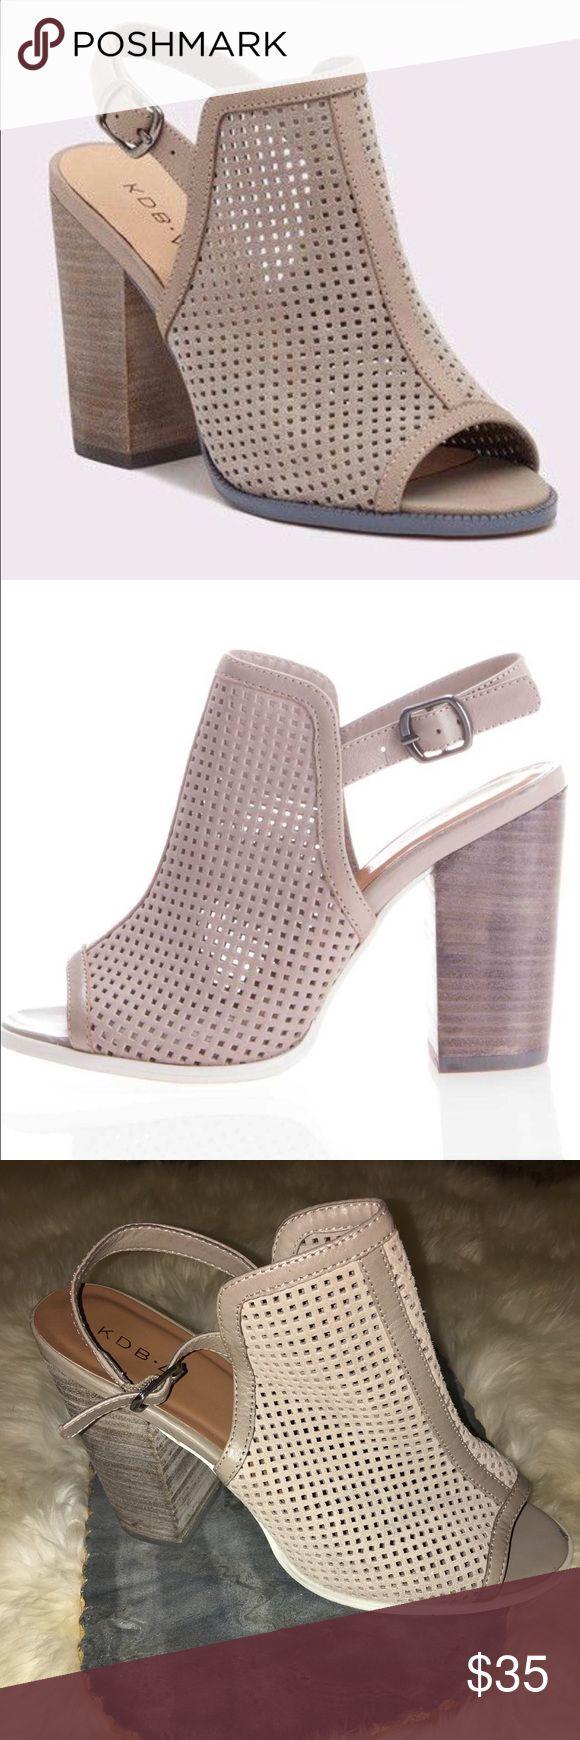 KDB Kelsi Dagger Brooklyn Goya Heels KDB Kelsi Dagger Brooklyn Goya Heels. Retail for $100+. Used, size 10. Kelsi Dagger Shoes Heels